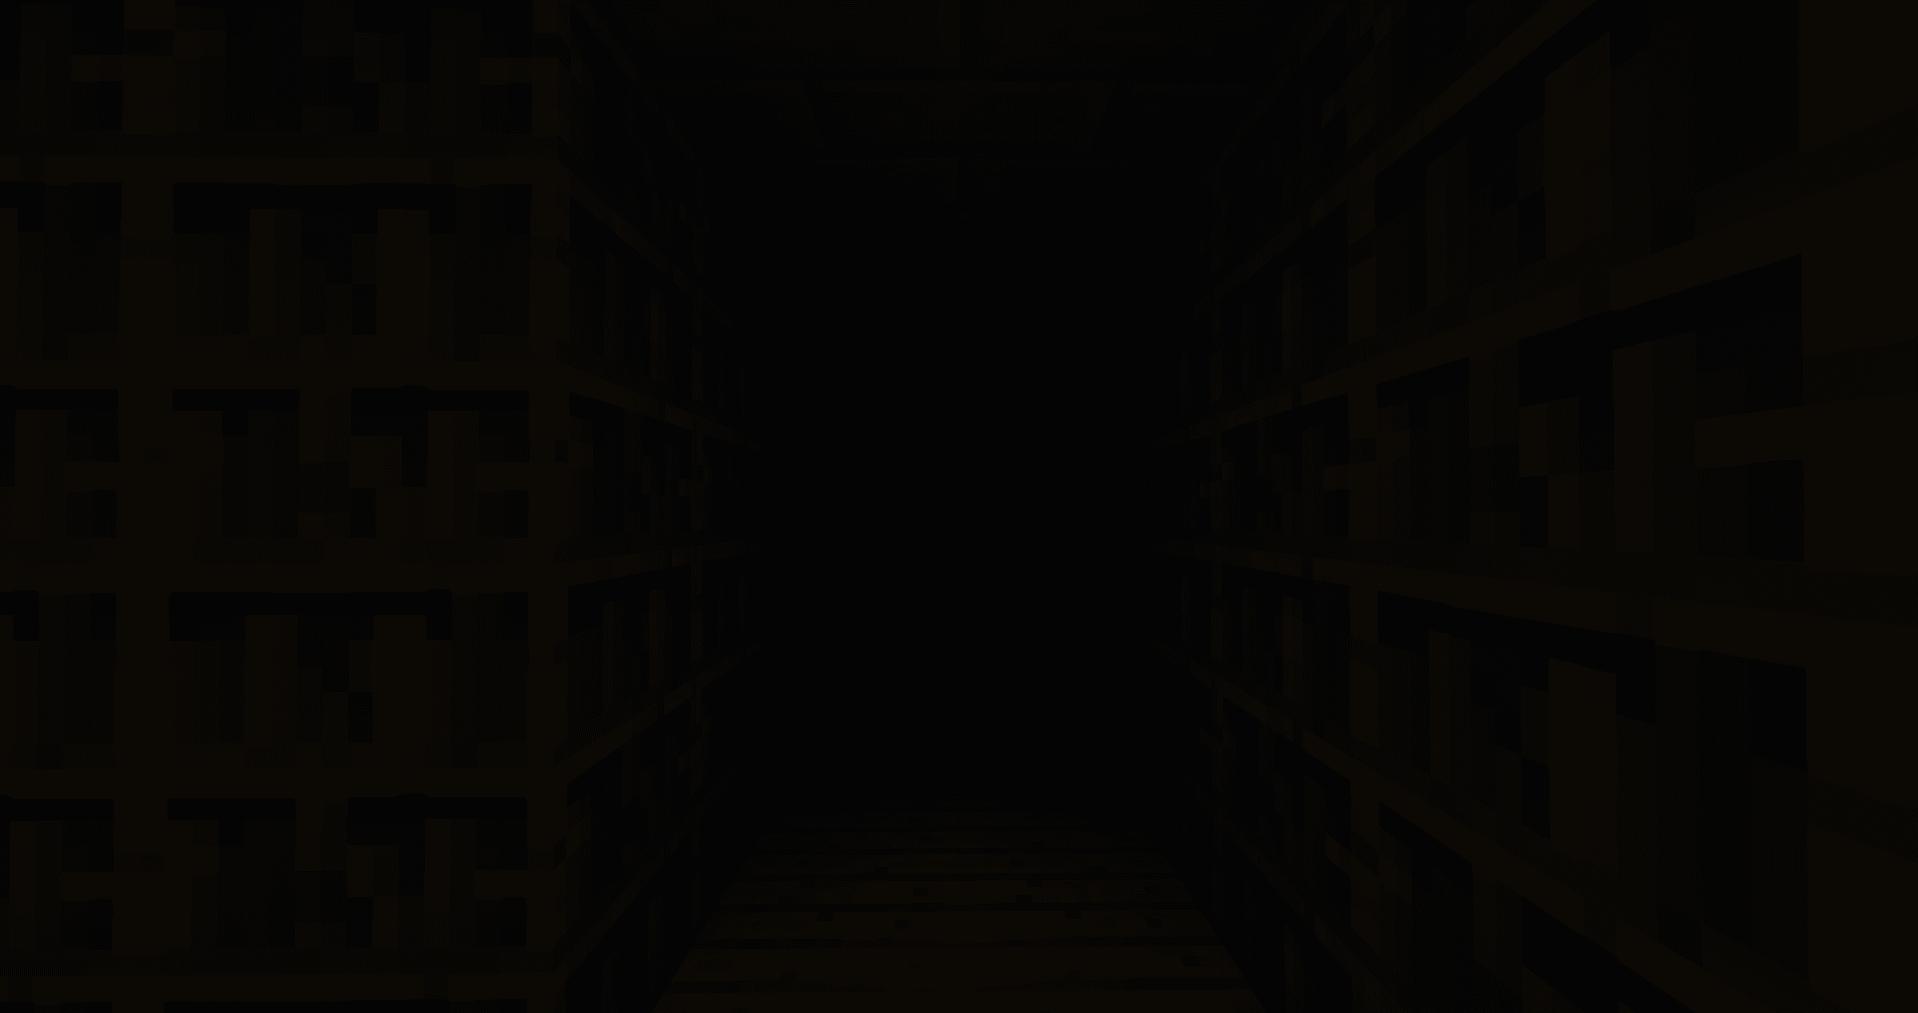 [ℳᎯ℘][TOP 5] - Хоррор карты II